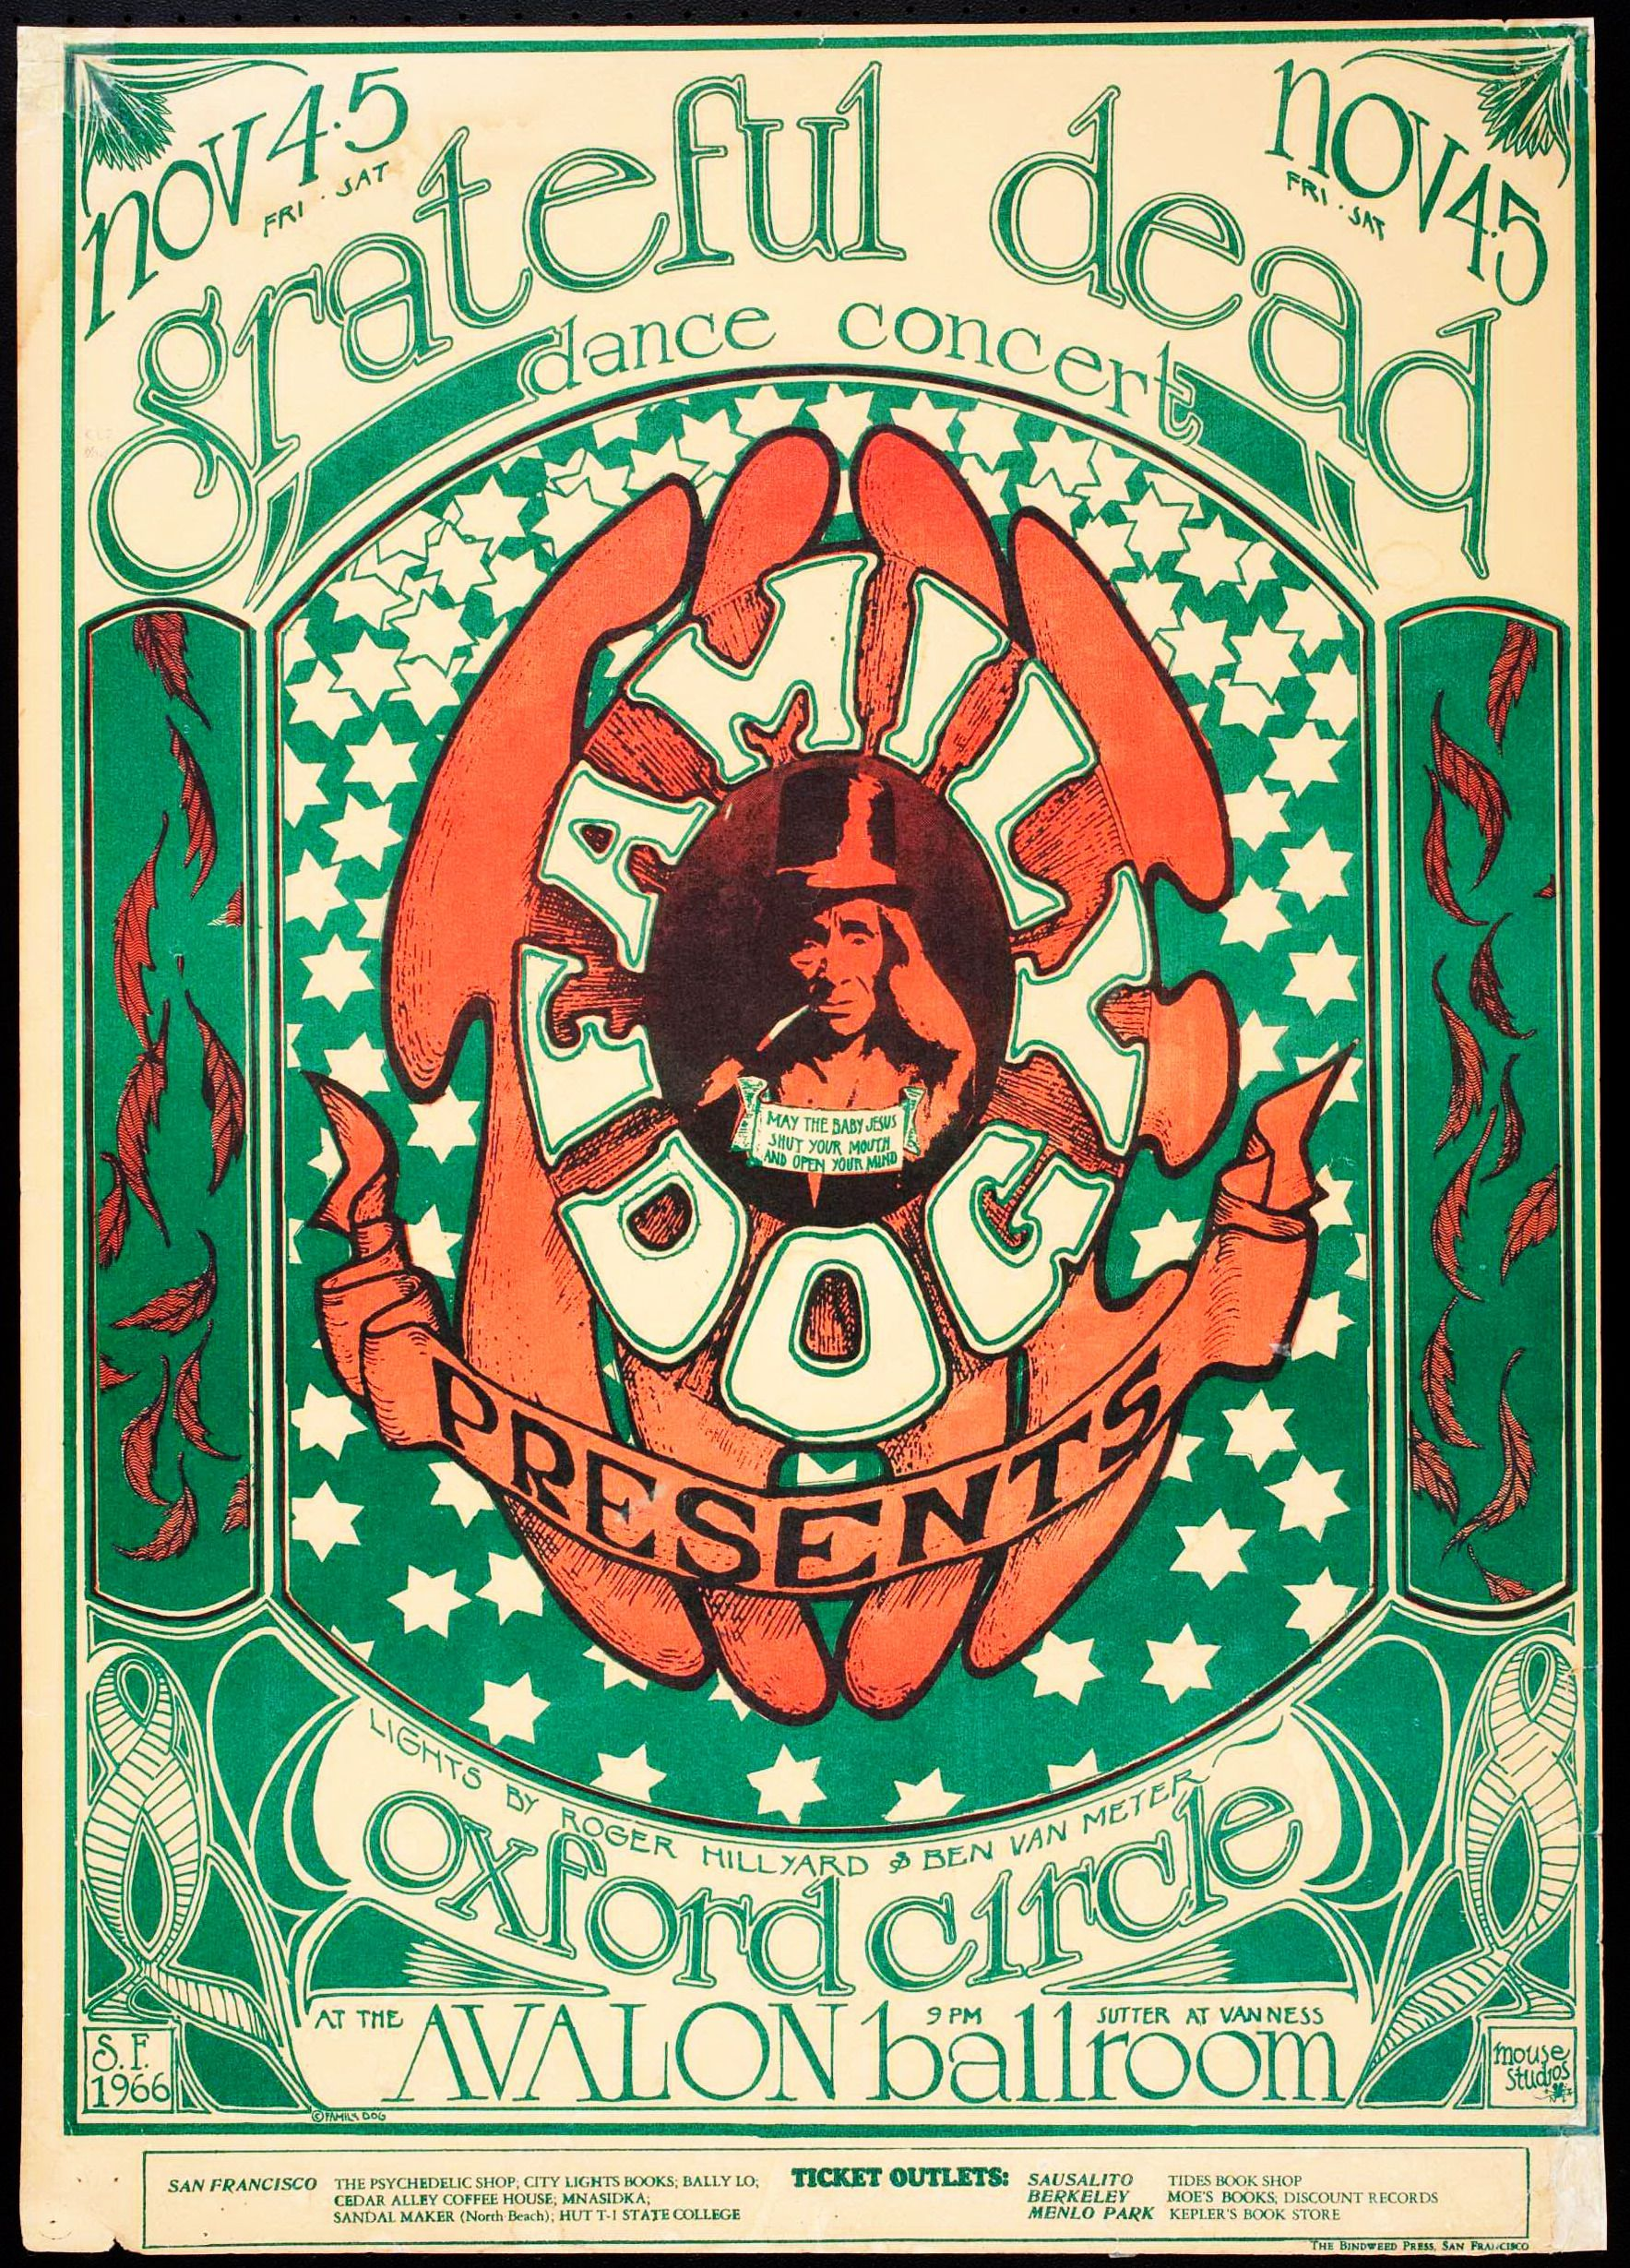 November 3-4, 1966 @ Avalon Ballroom - San Francisco Artists: Alton Kelley